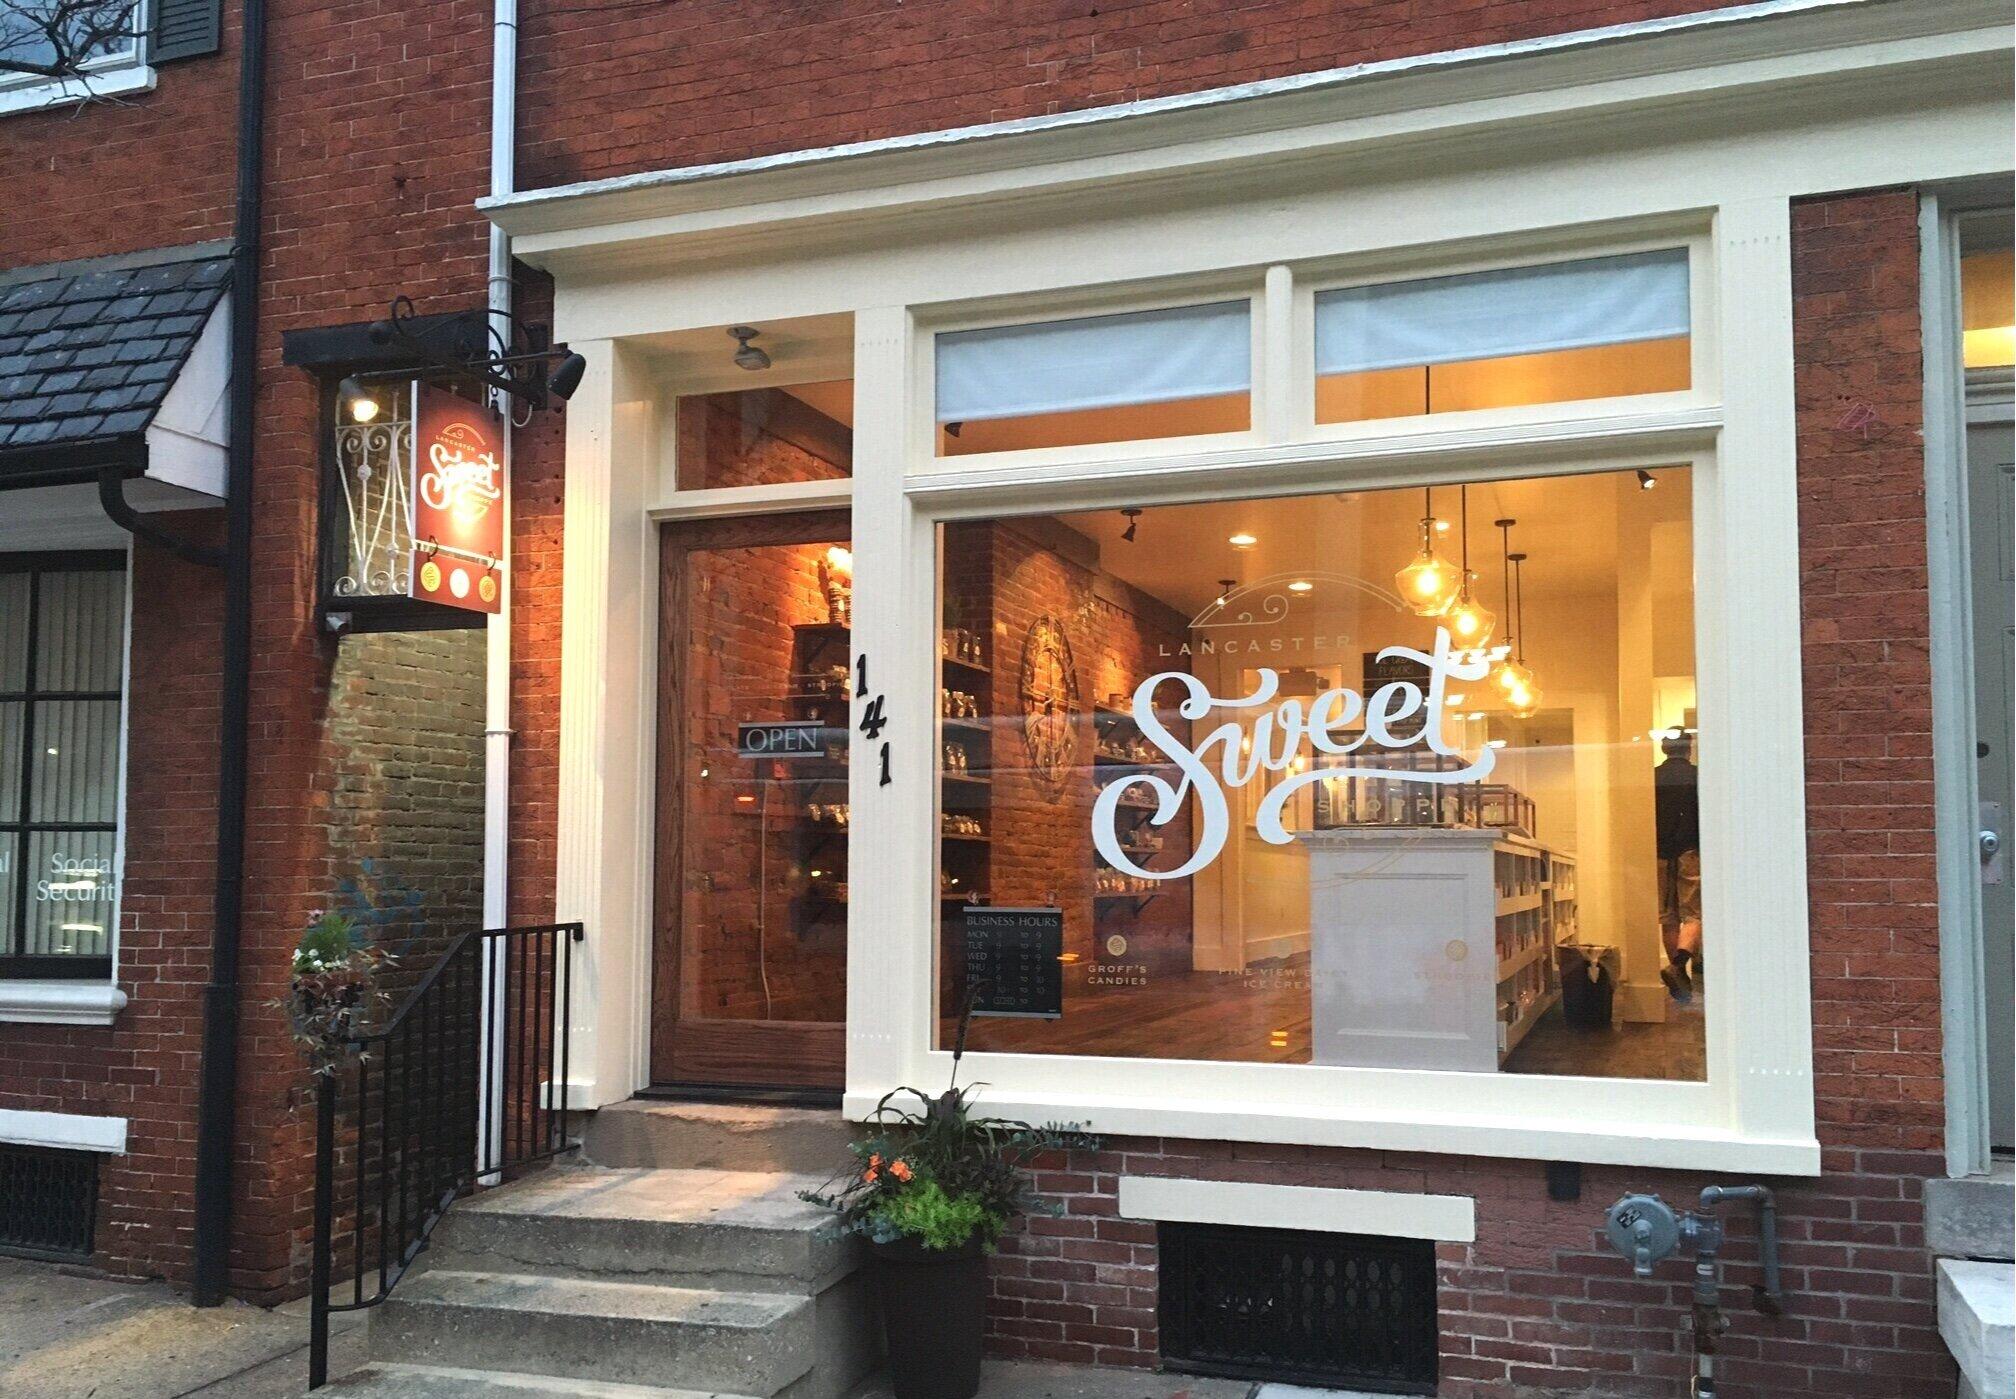 Lancaster Sweet Shoppe